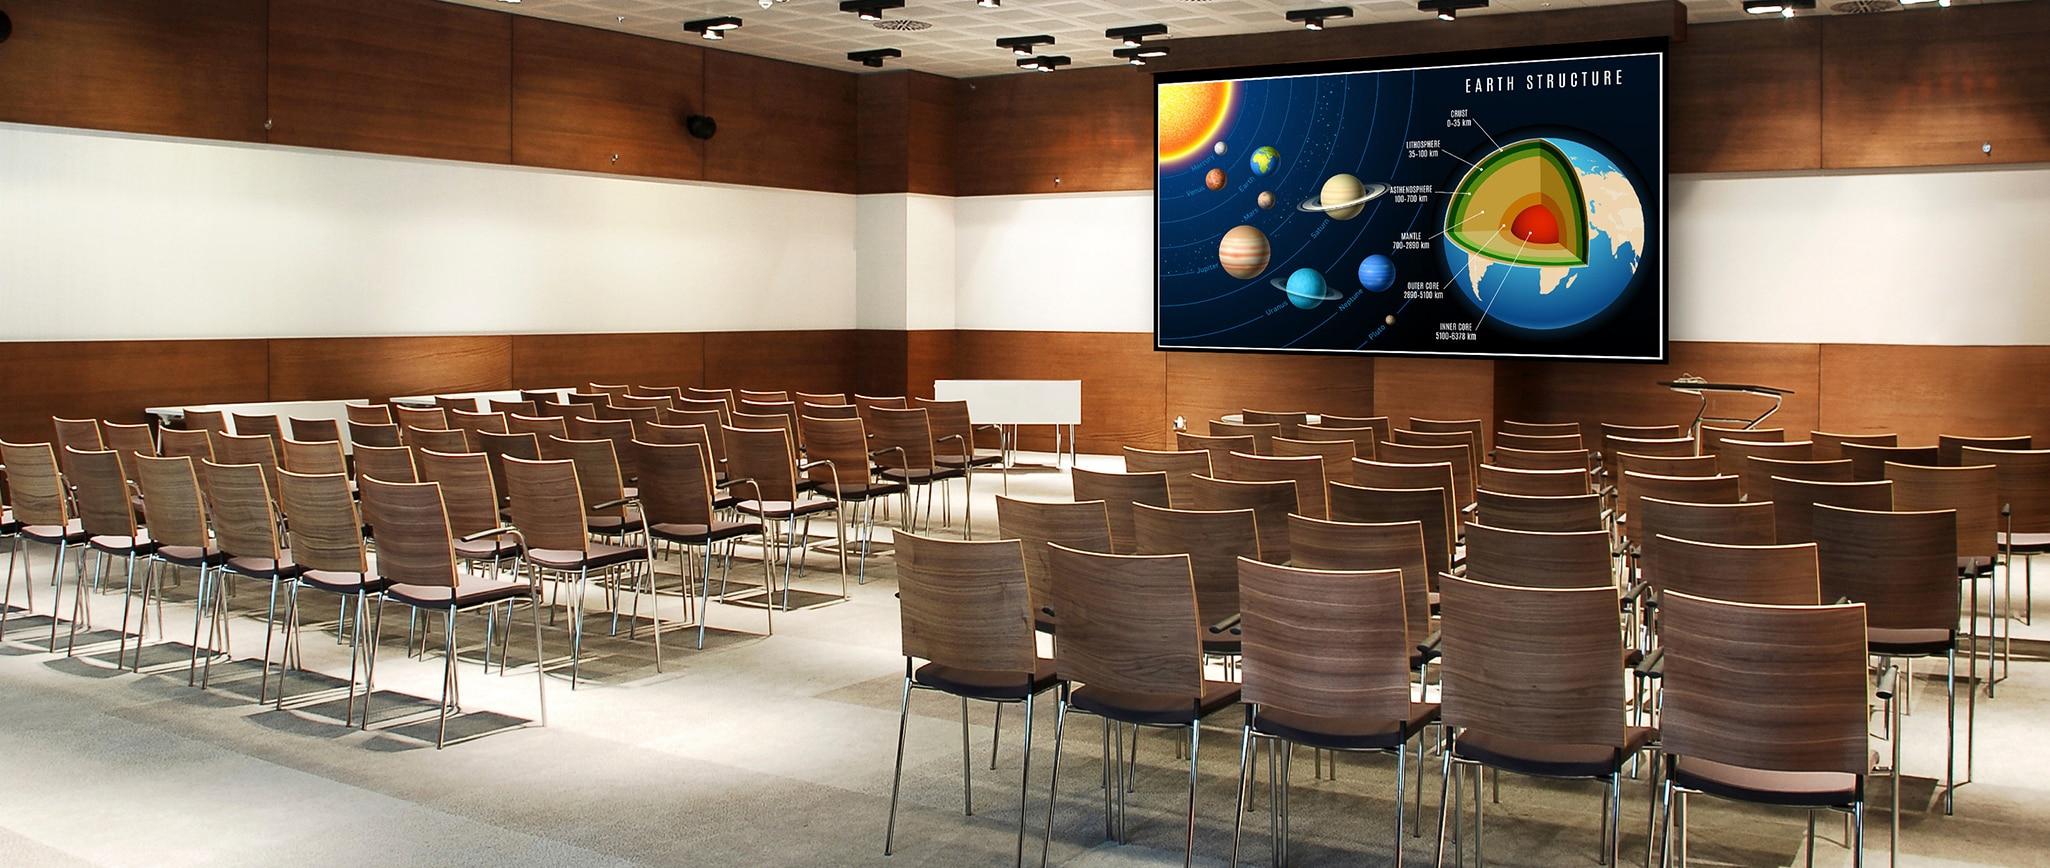 VPL-FHZ70 classroom projector